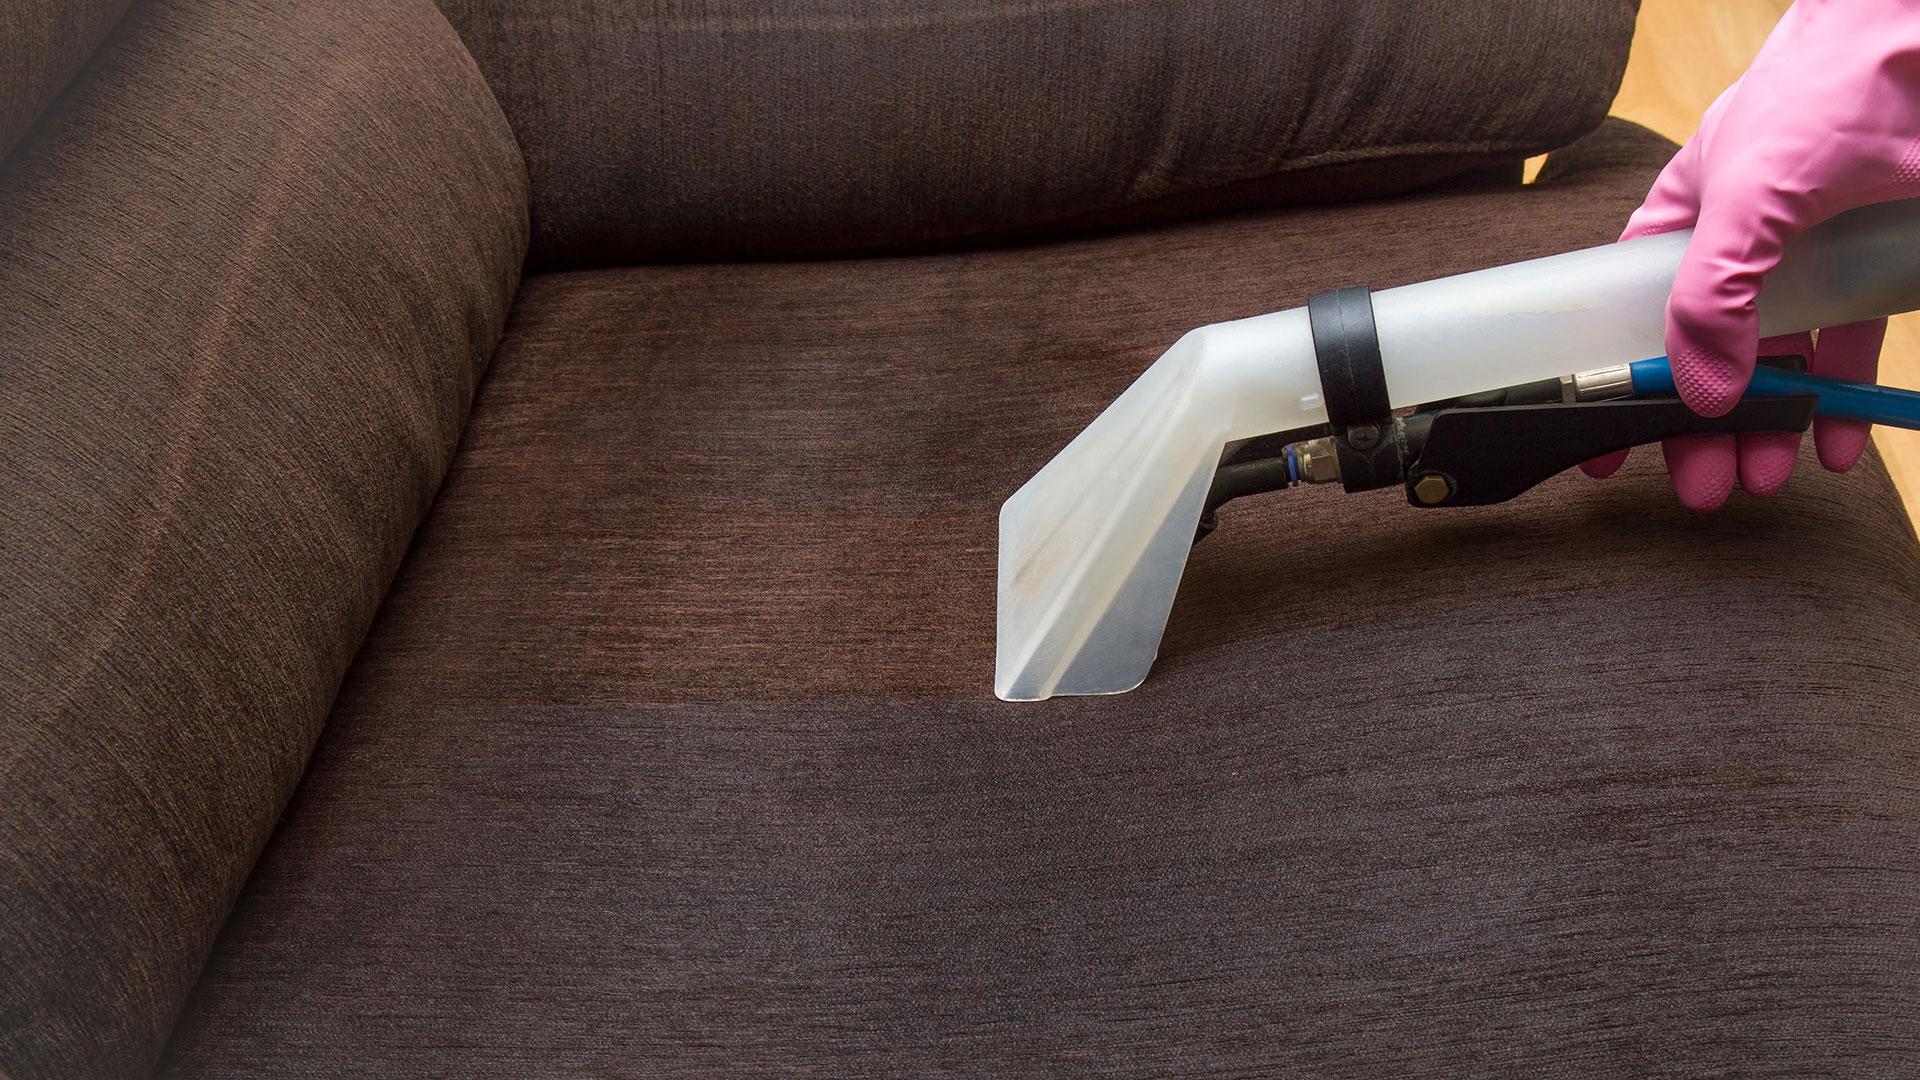 Sofa Cleaning Glen Alpine